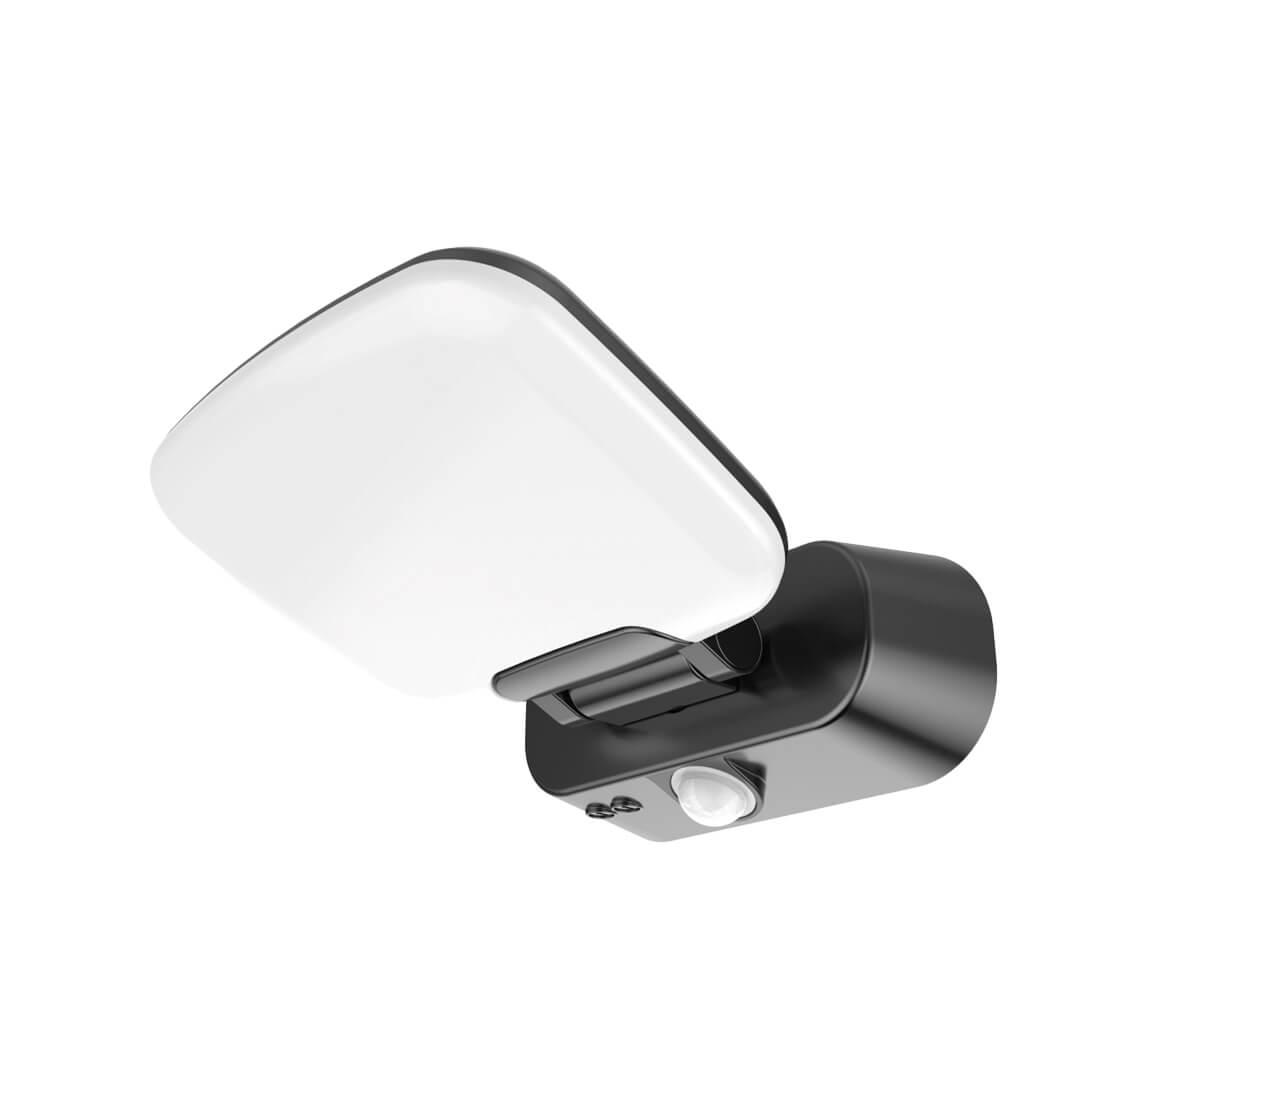 260 degree rotating motion sensor wall Light